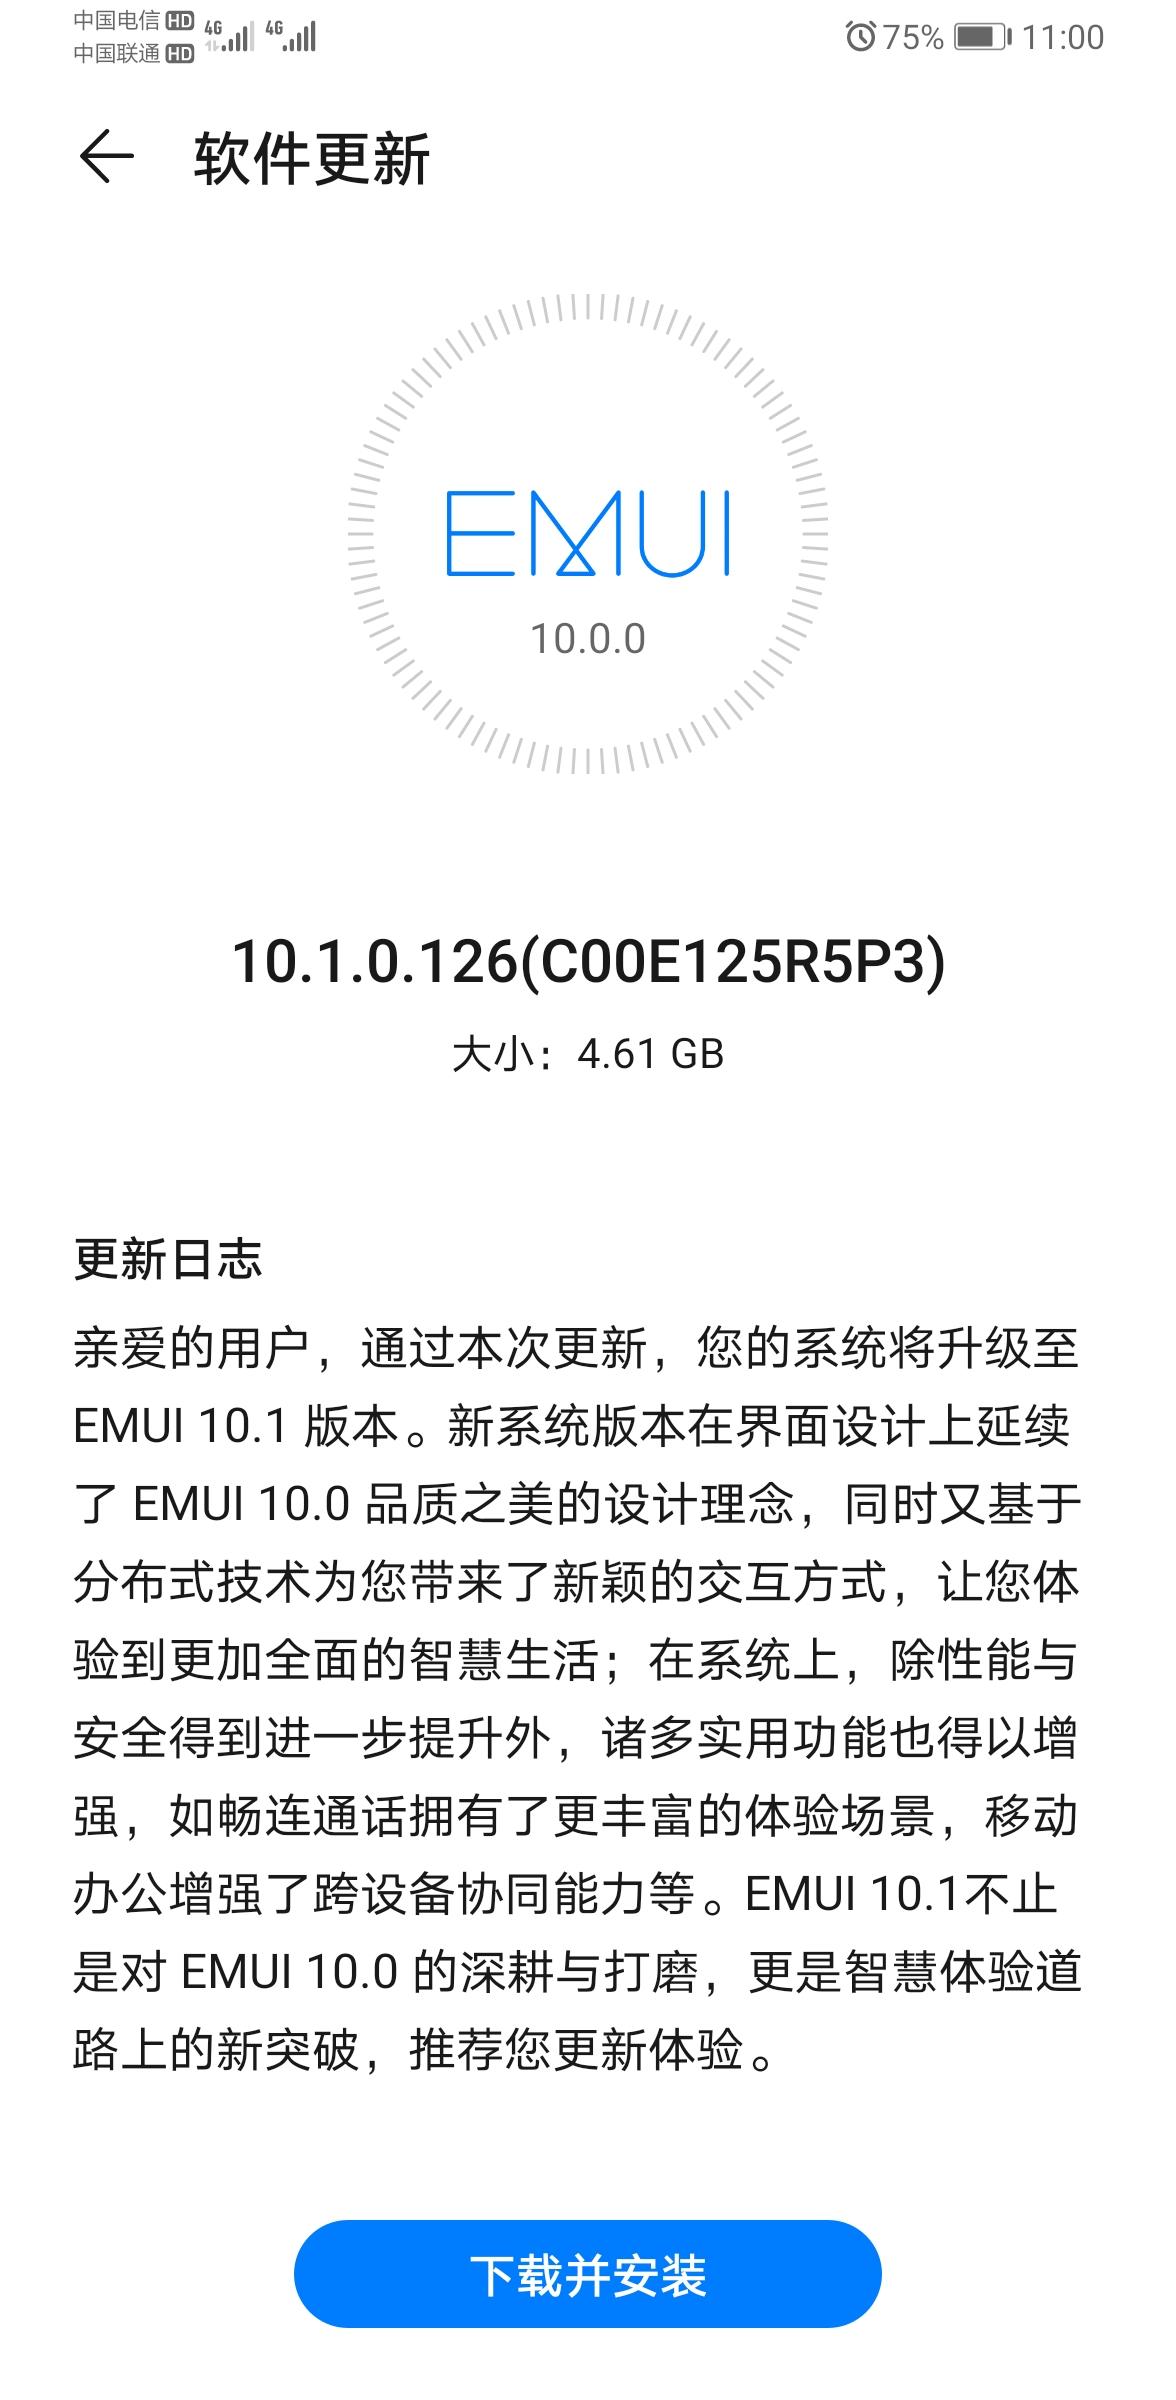 Screenshot_20200509_110001_com.huawei.android.hwouc.jpg